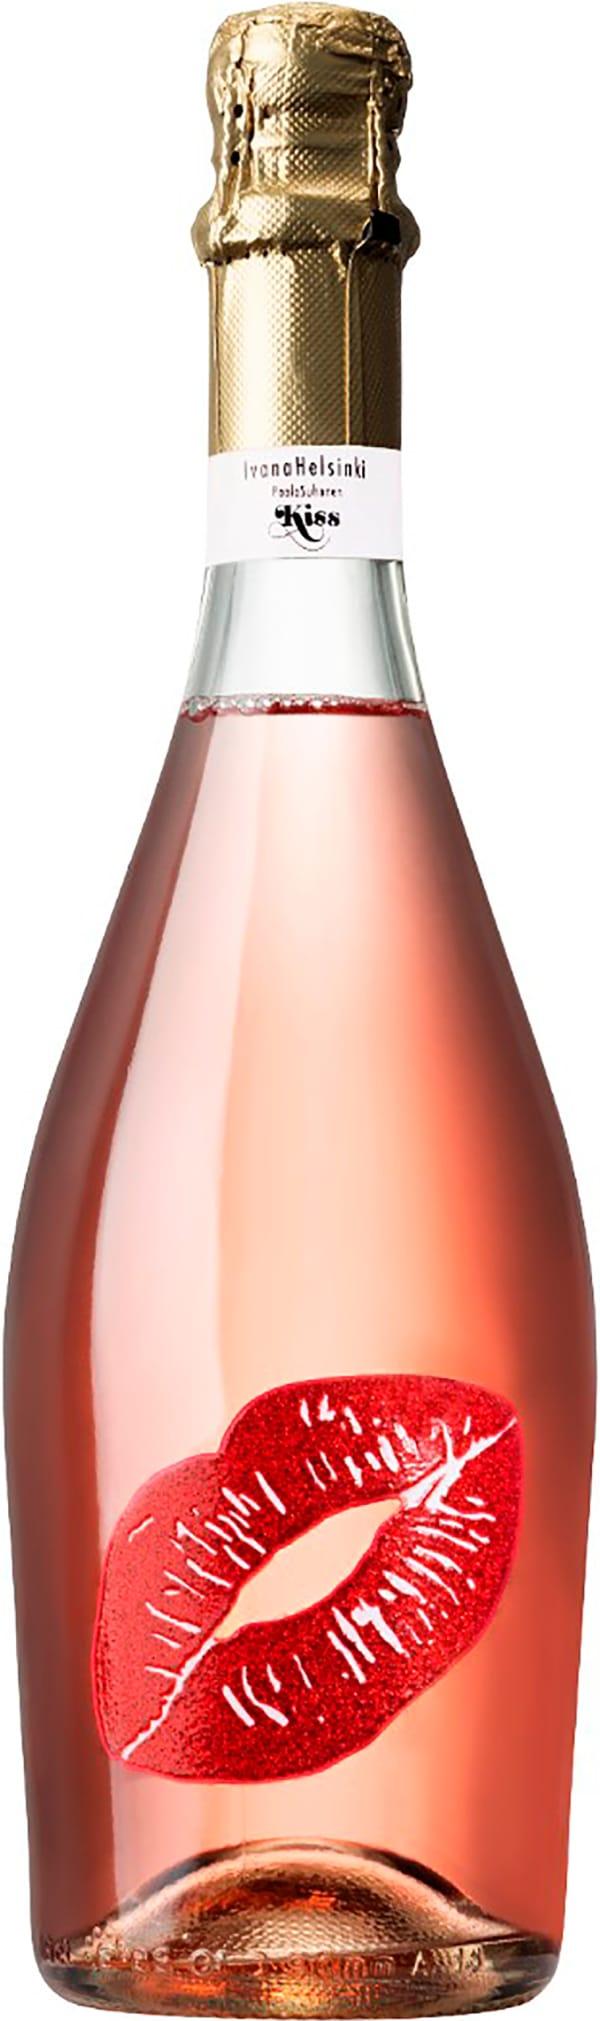 Ivana Helsinki Paola Suhonen Kiss Prosecco Rosé Extra Dry 2020